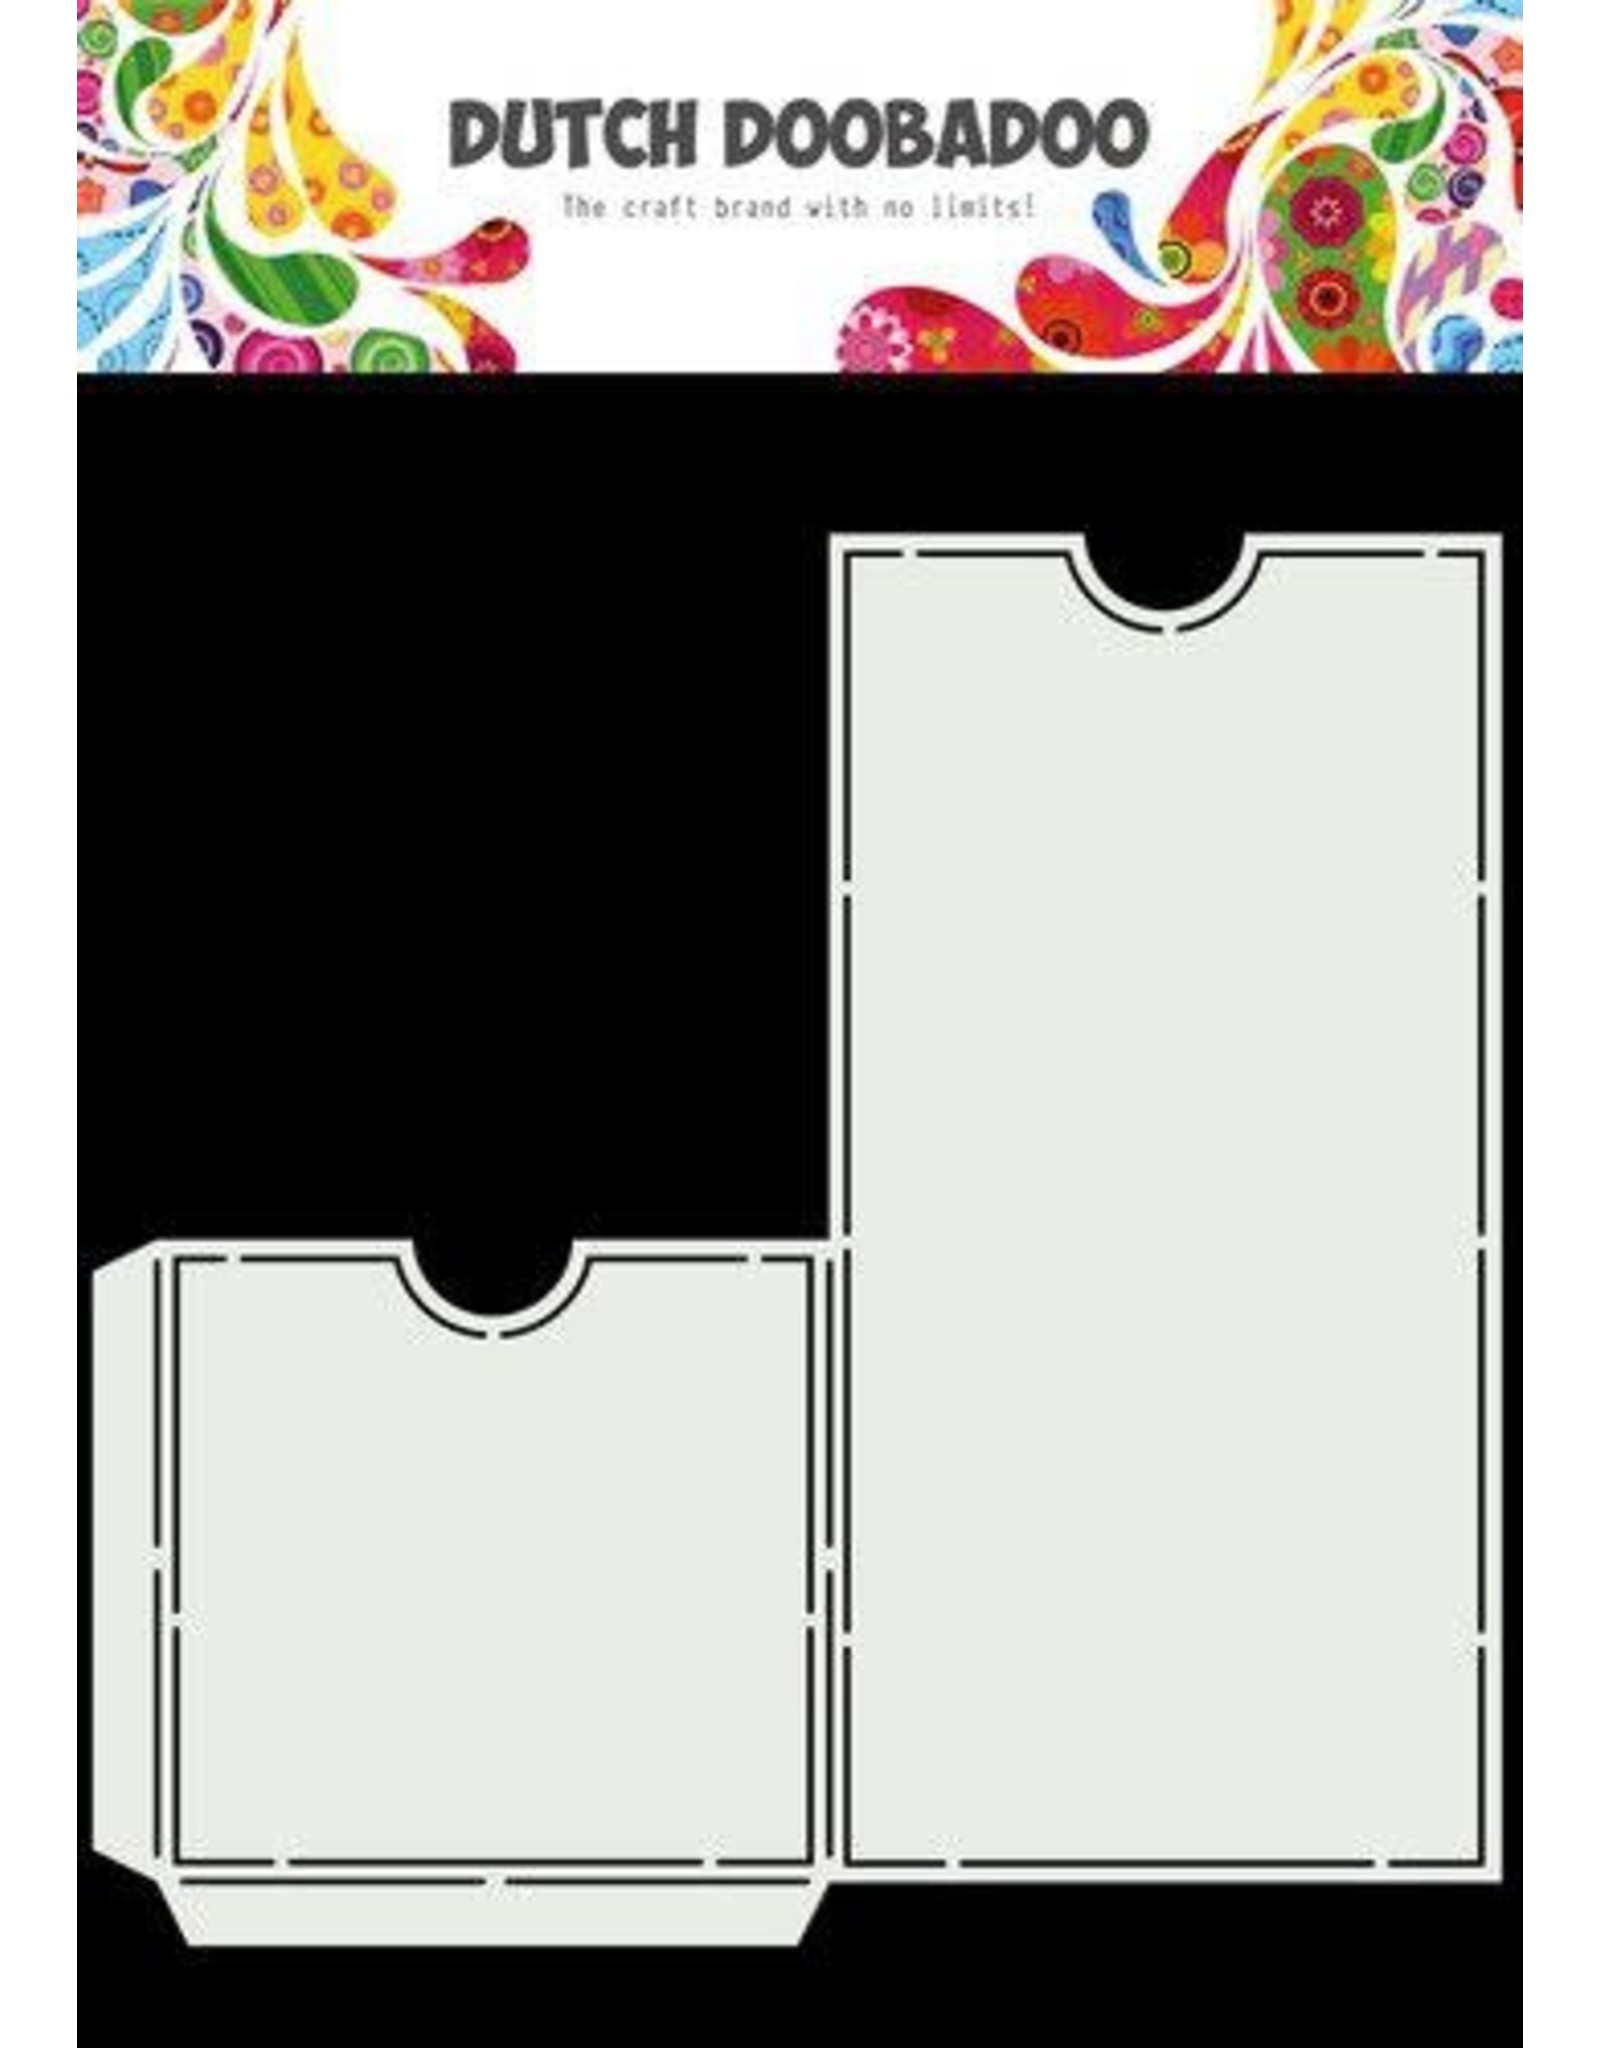 Dutch Doobadoo Dutch Doobadoo Slimline Label Pocket 470.784.043 210x220mm